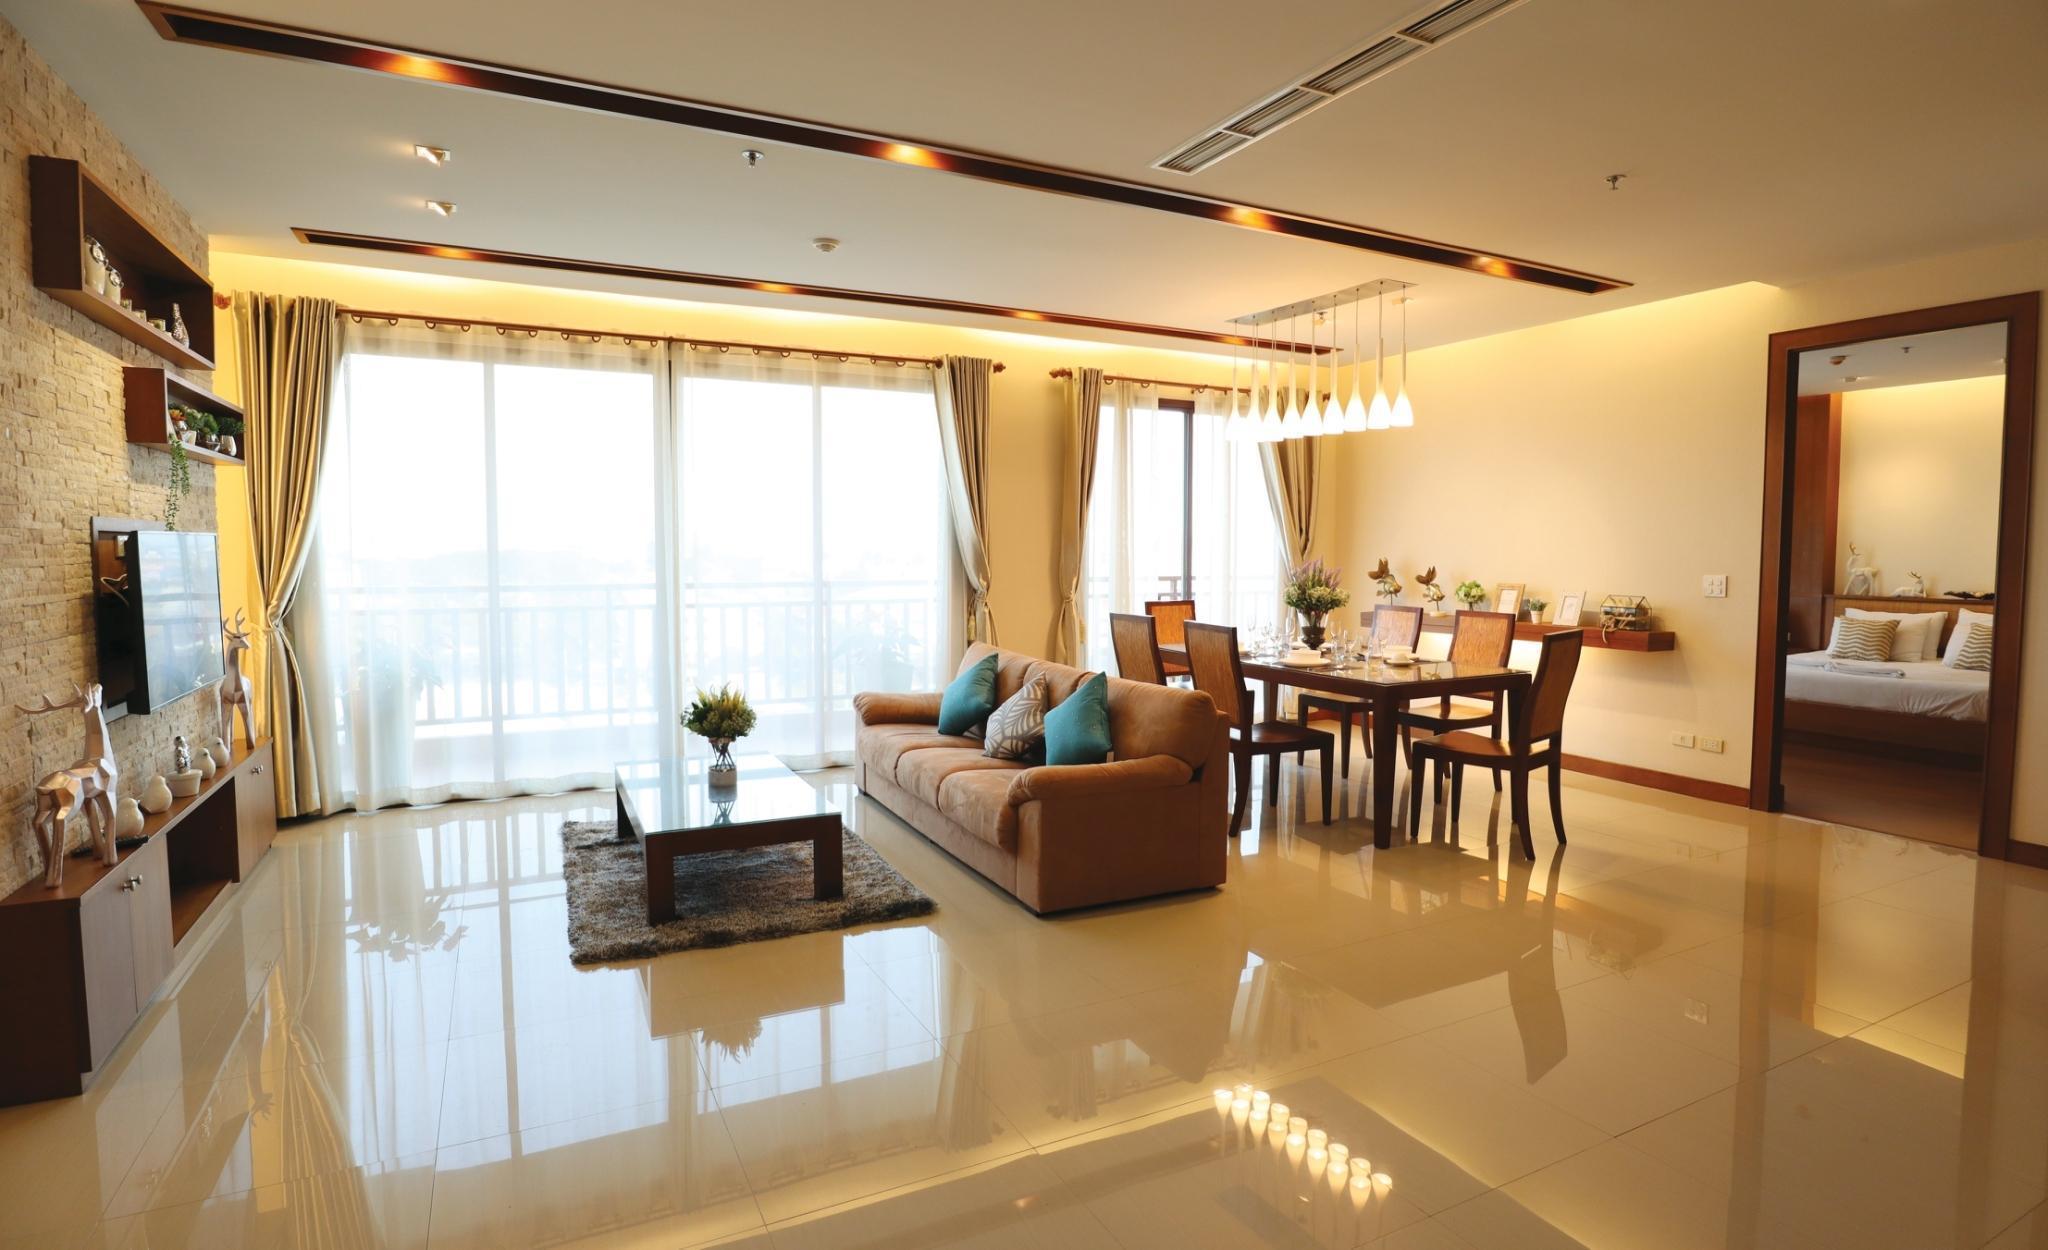 Pattaya City Resort  by Harmony วิลลา 2 ห้องนอน 3 ห้องน้ำส่วนตัว ขนาด 138 ตร.ม. – พัทยาใต้